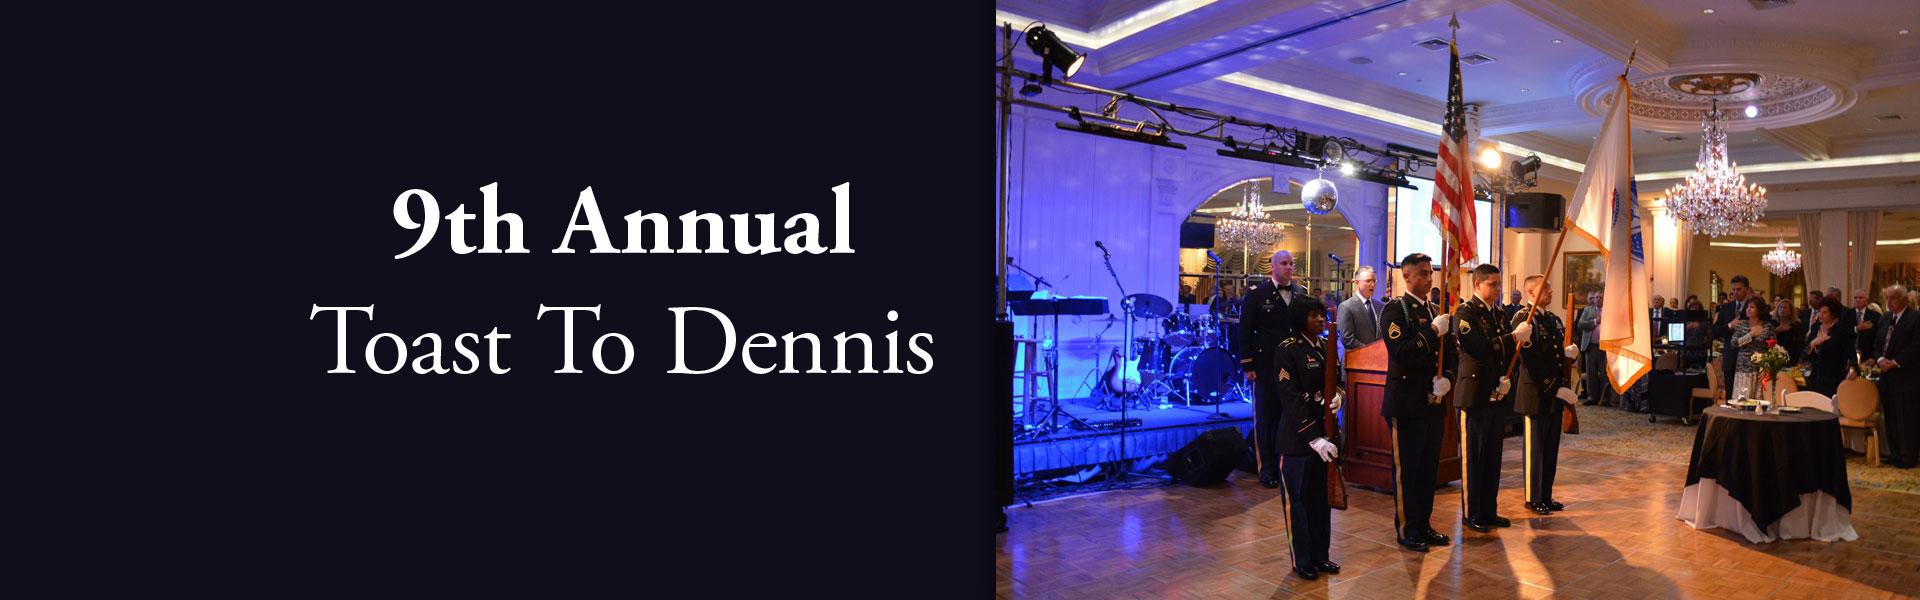 Lt. Dennis W. Zilinski II, Memorial Fund